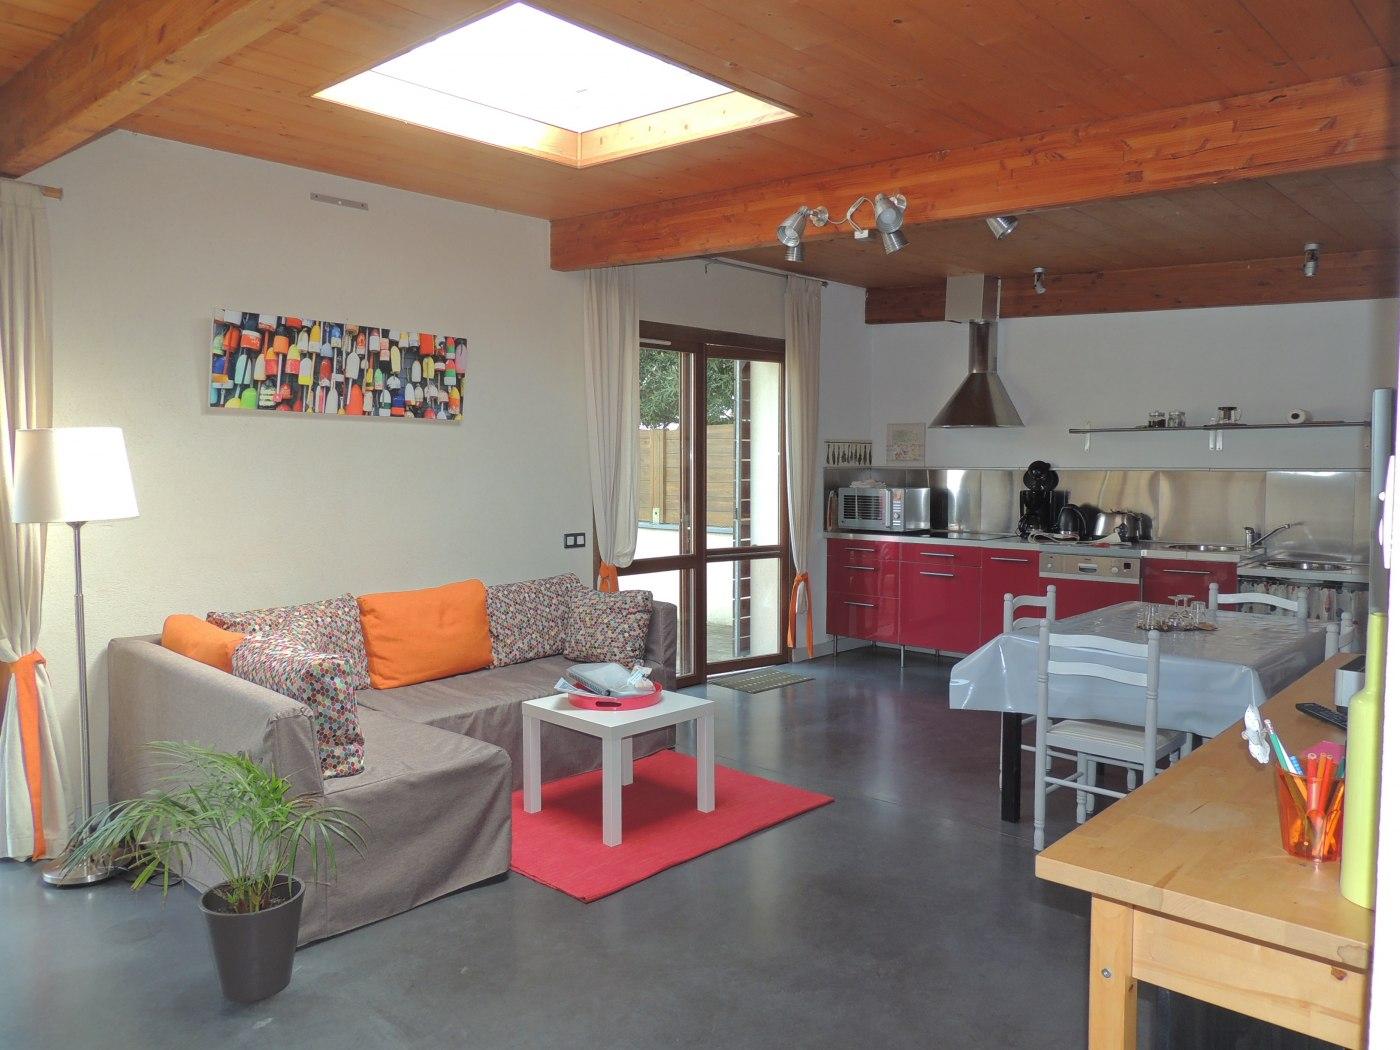 maison vacances gu rande location 4 personnes christiane marion. Black Bedroom Furniture Sets. Home Design Ideas